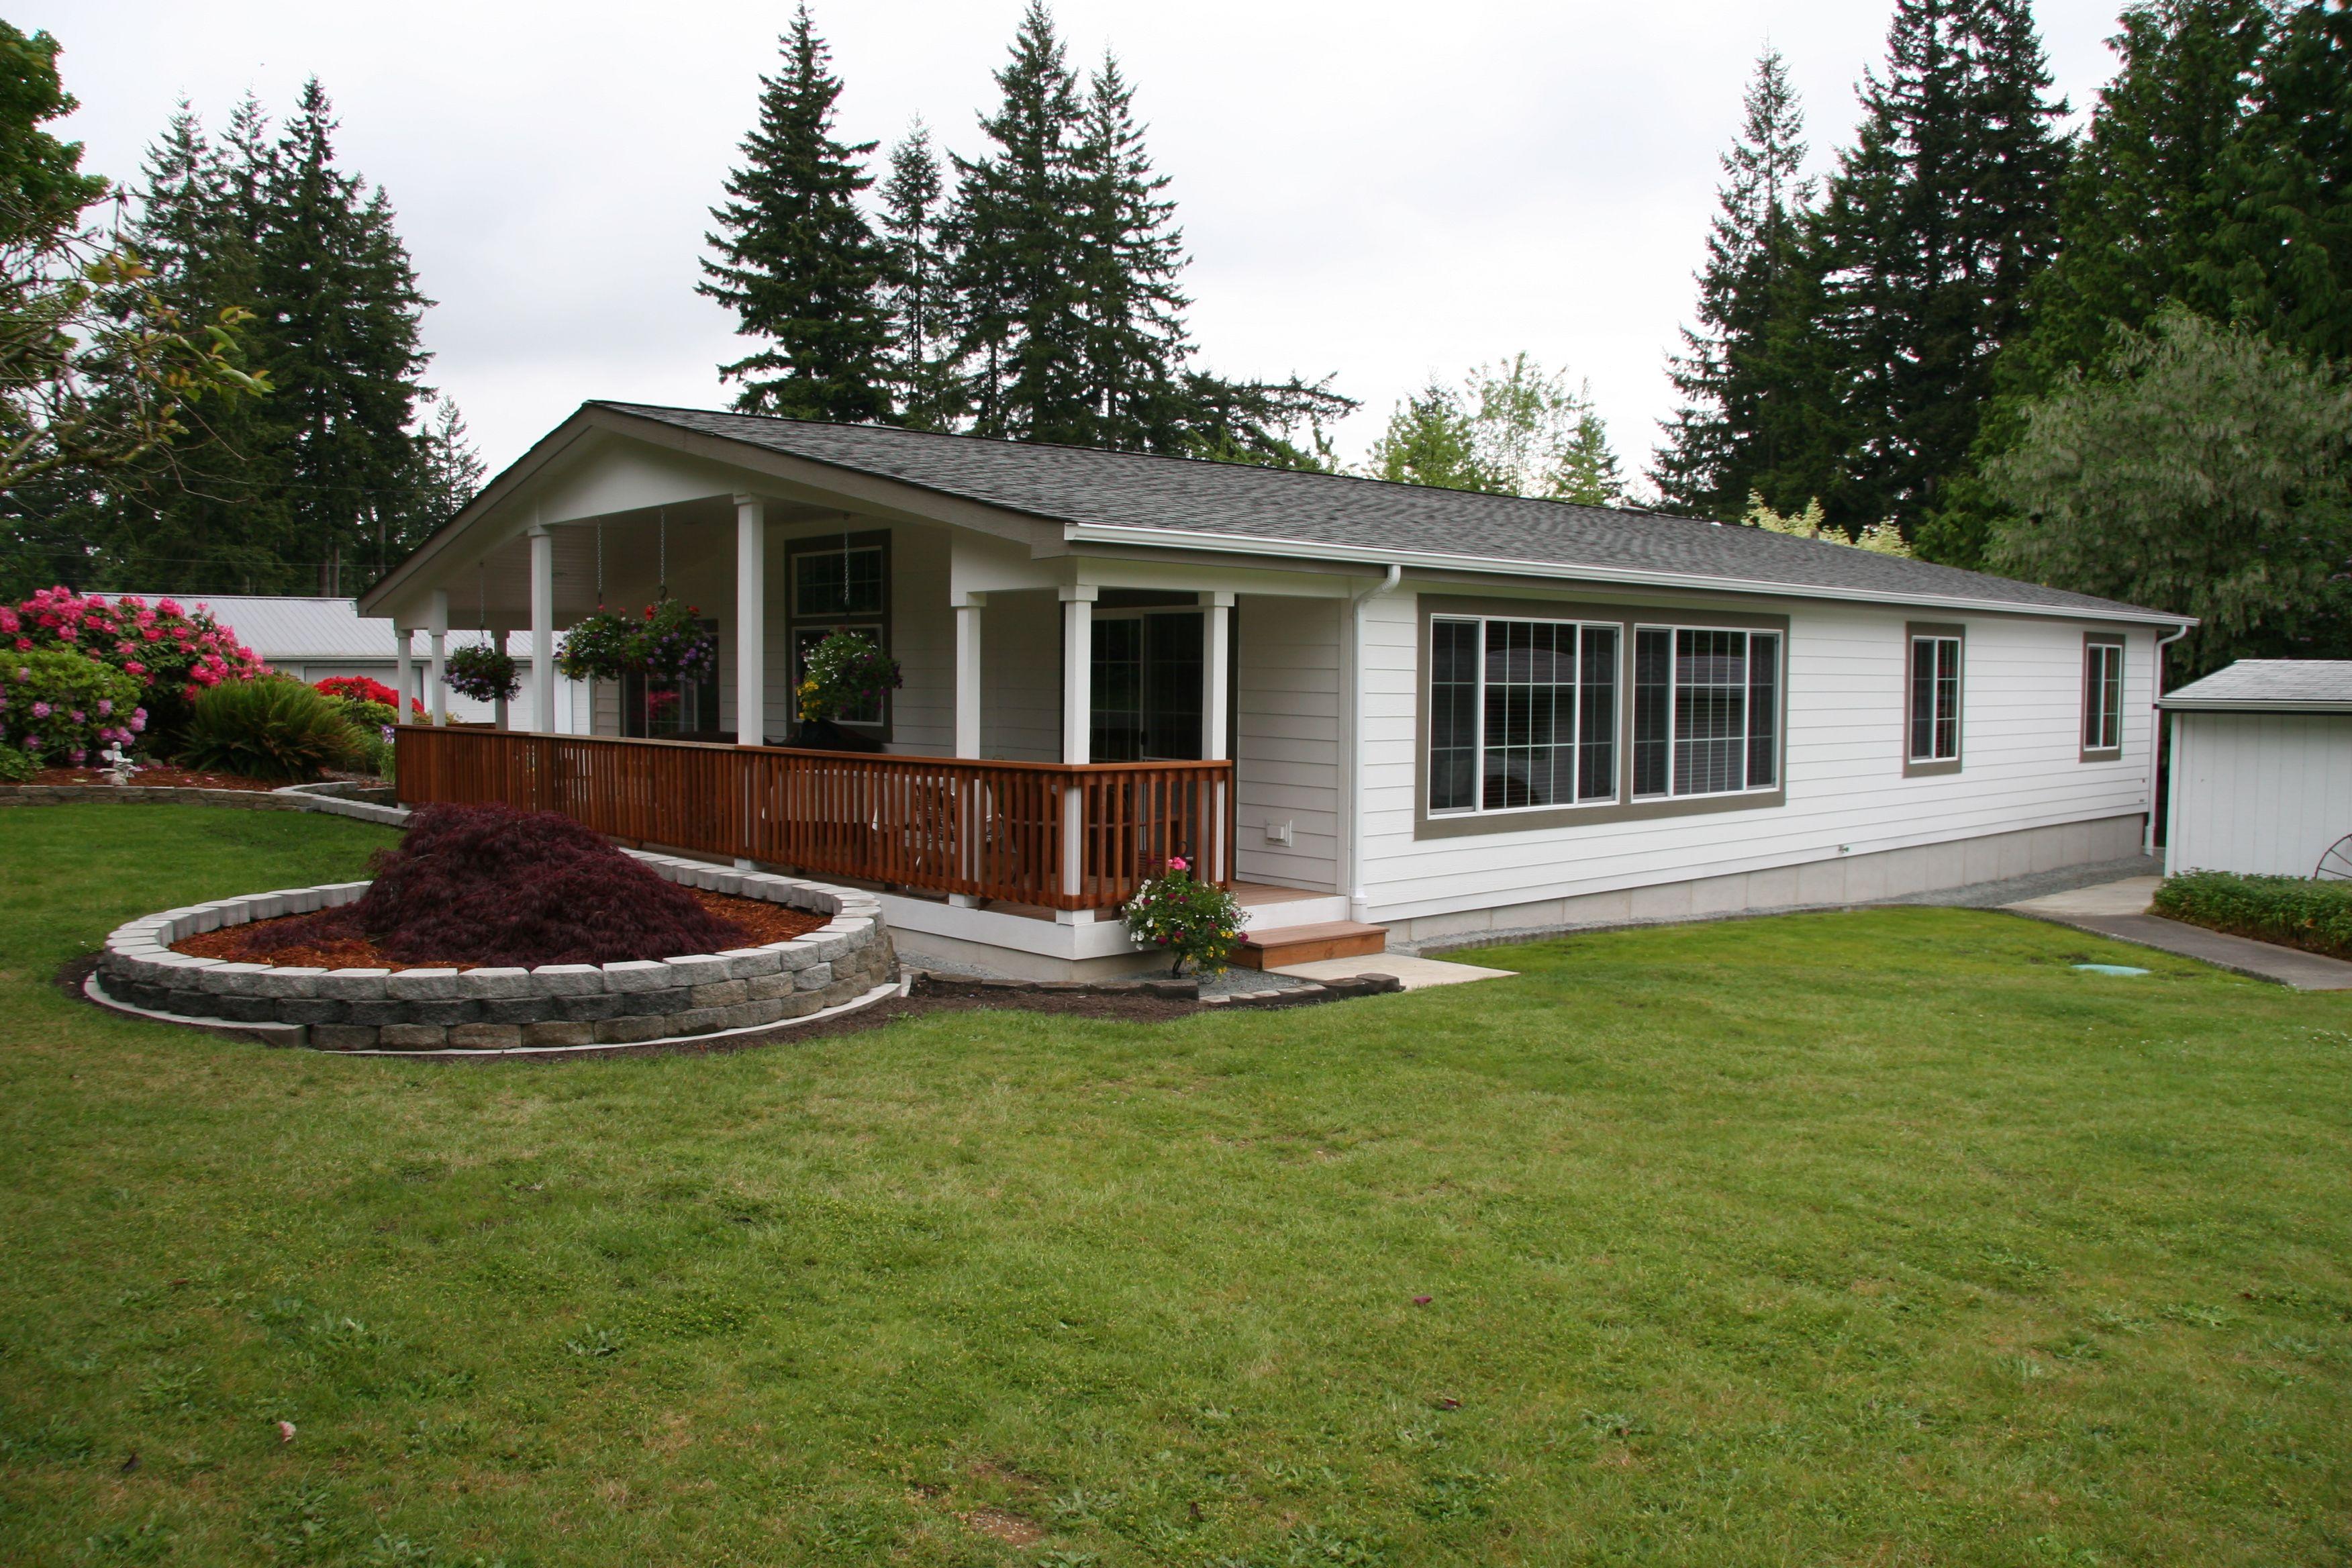 Mobile home with Duraskirt concrete skirting. Duraskirt can ... on cape cod beams, log home beams, house beams,